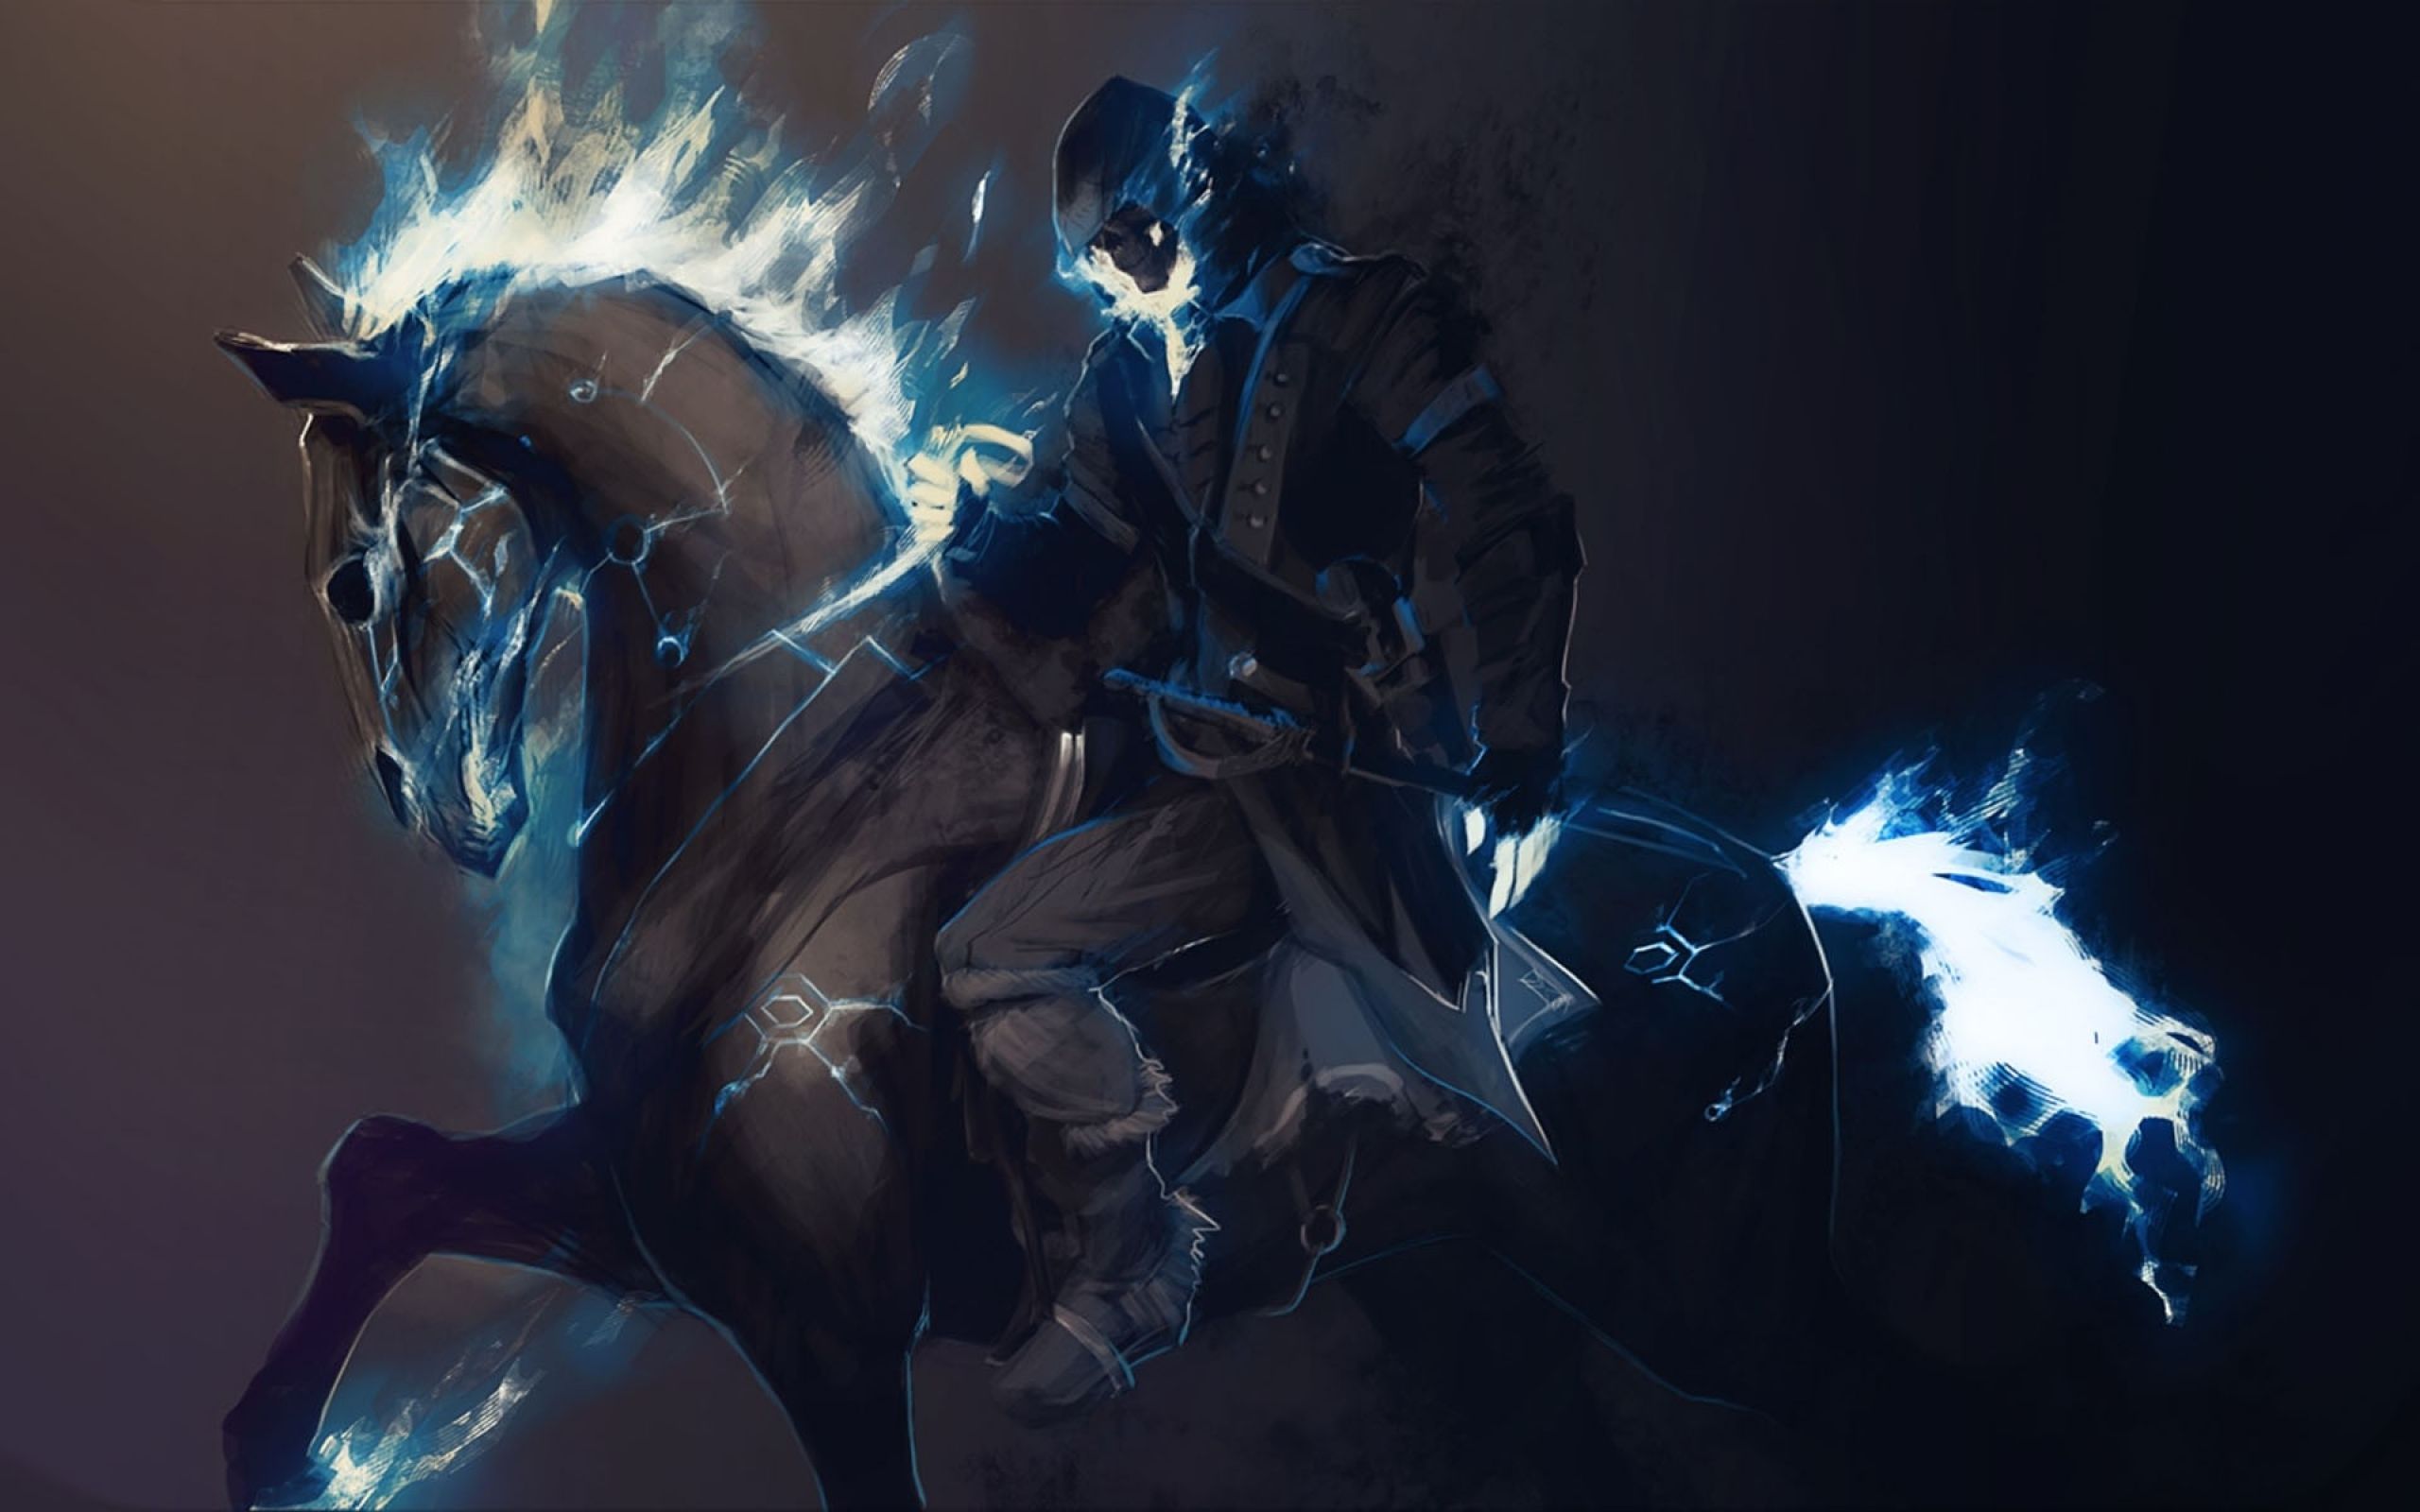 Popular Wallpaper Horse Assassin'S Creed - 7b0d837d380cda03c7eedbffe800d563  Picture_959661.jpg